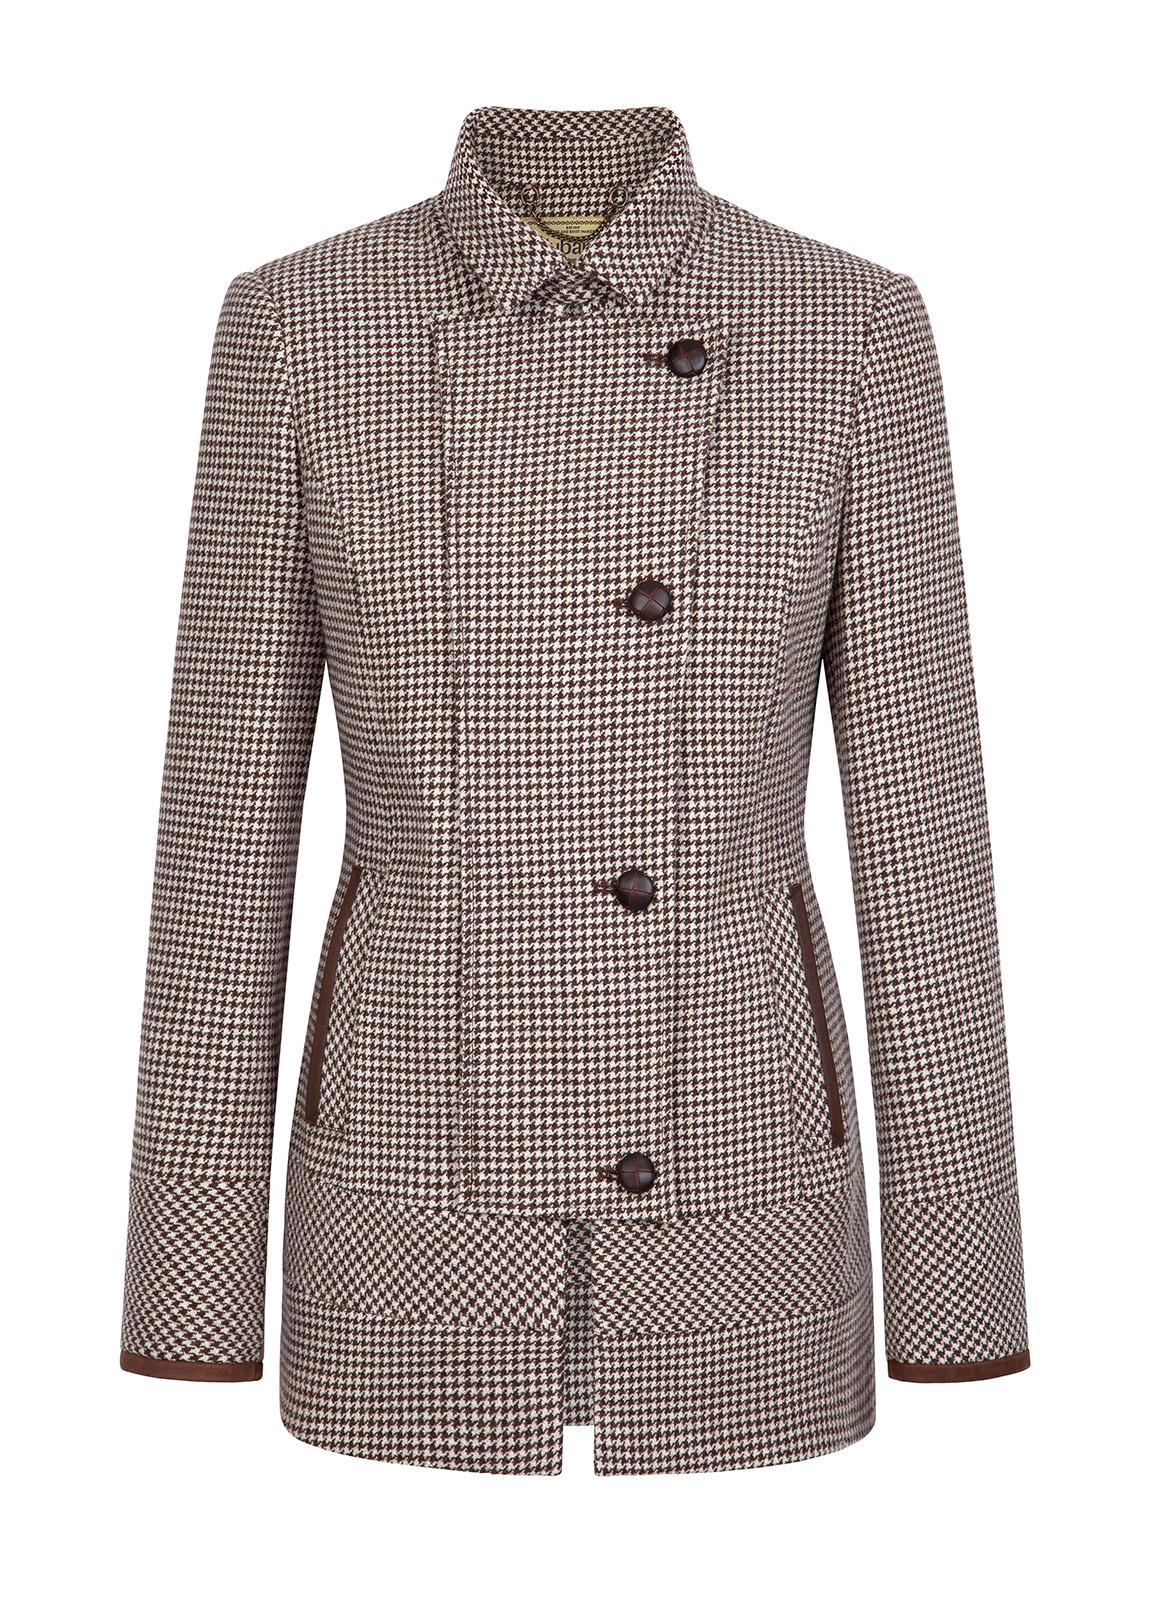 Dubarry_Willow Tweed Jacket - Cafe_Image_2